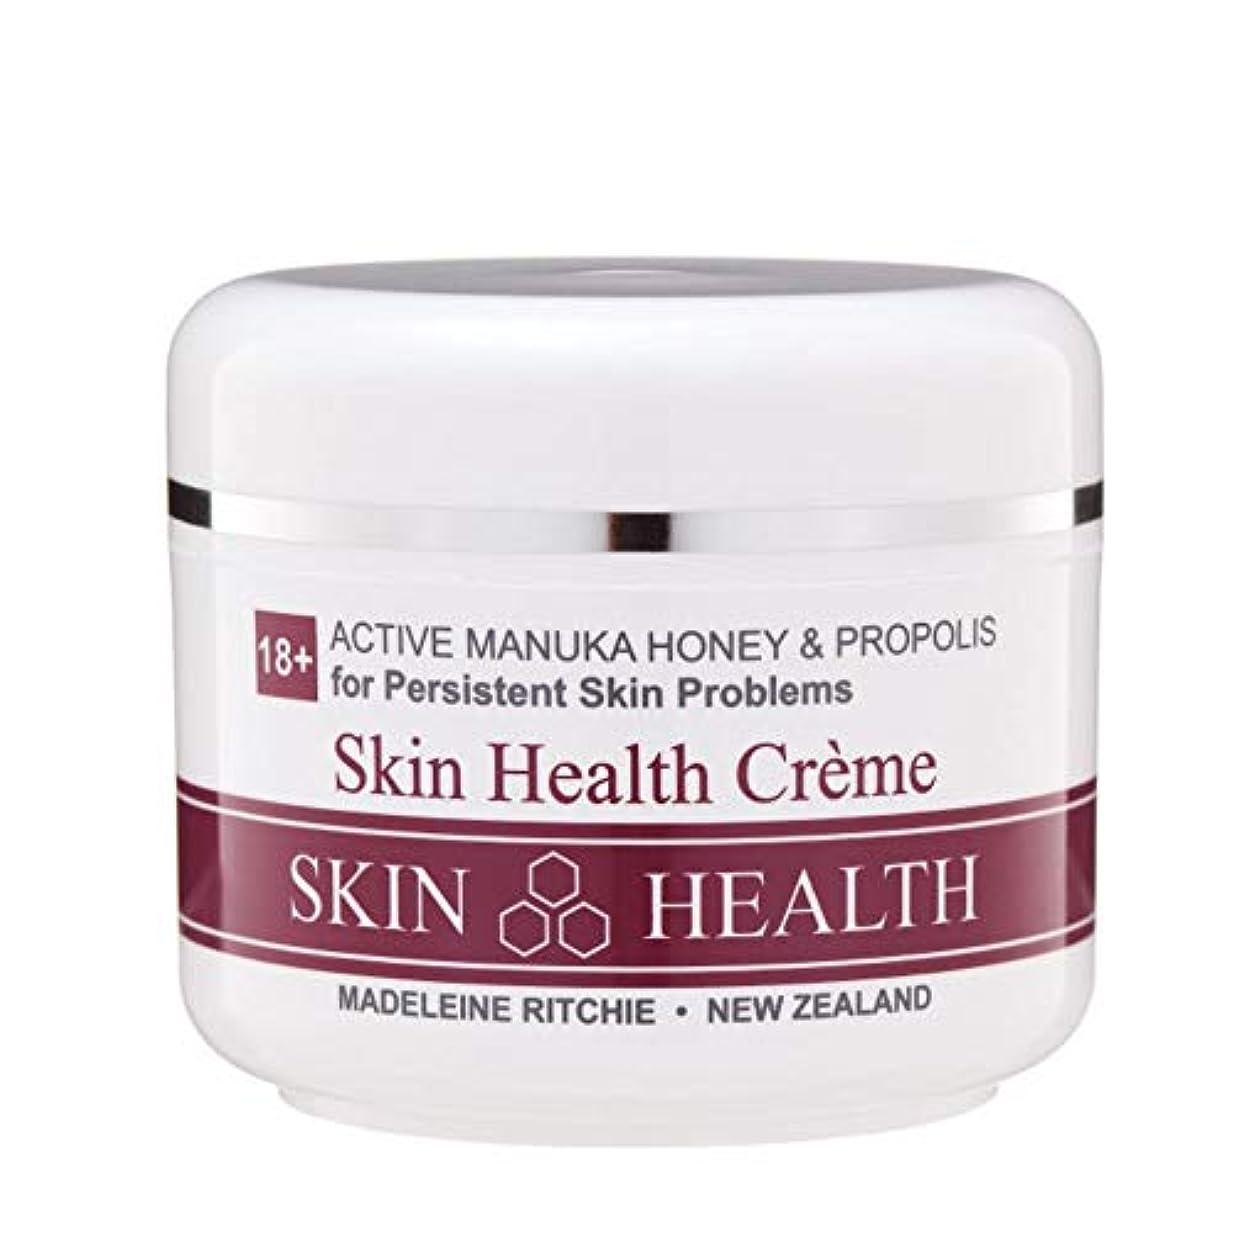 Madeleine Ritchie New Zealand 18+ Active Manuka Honey Skin Health Cream Jar 100ml